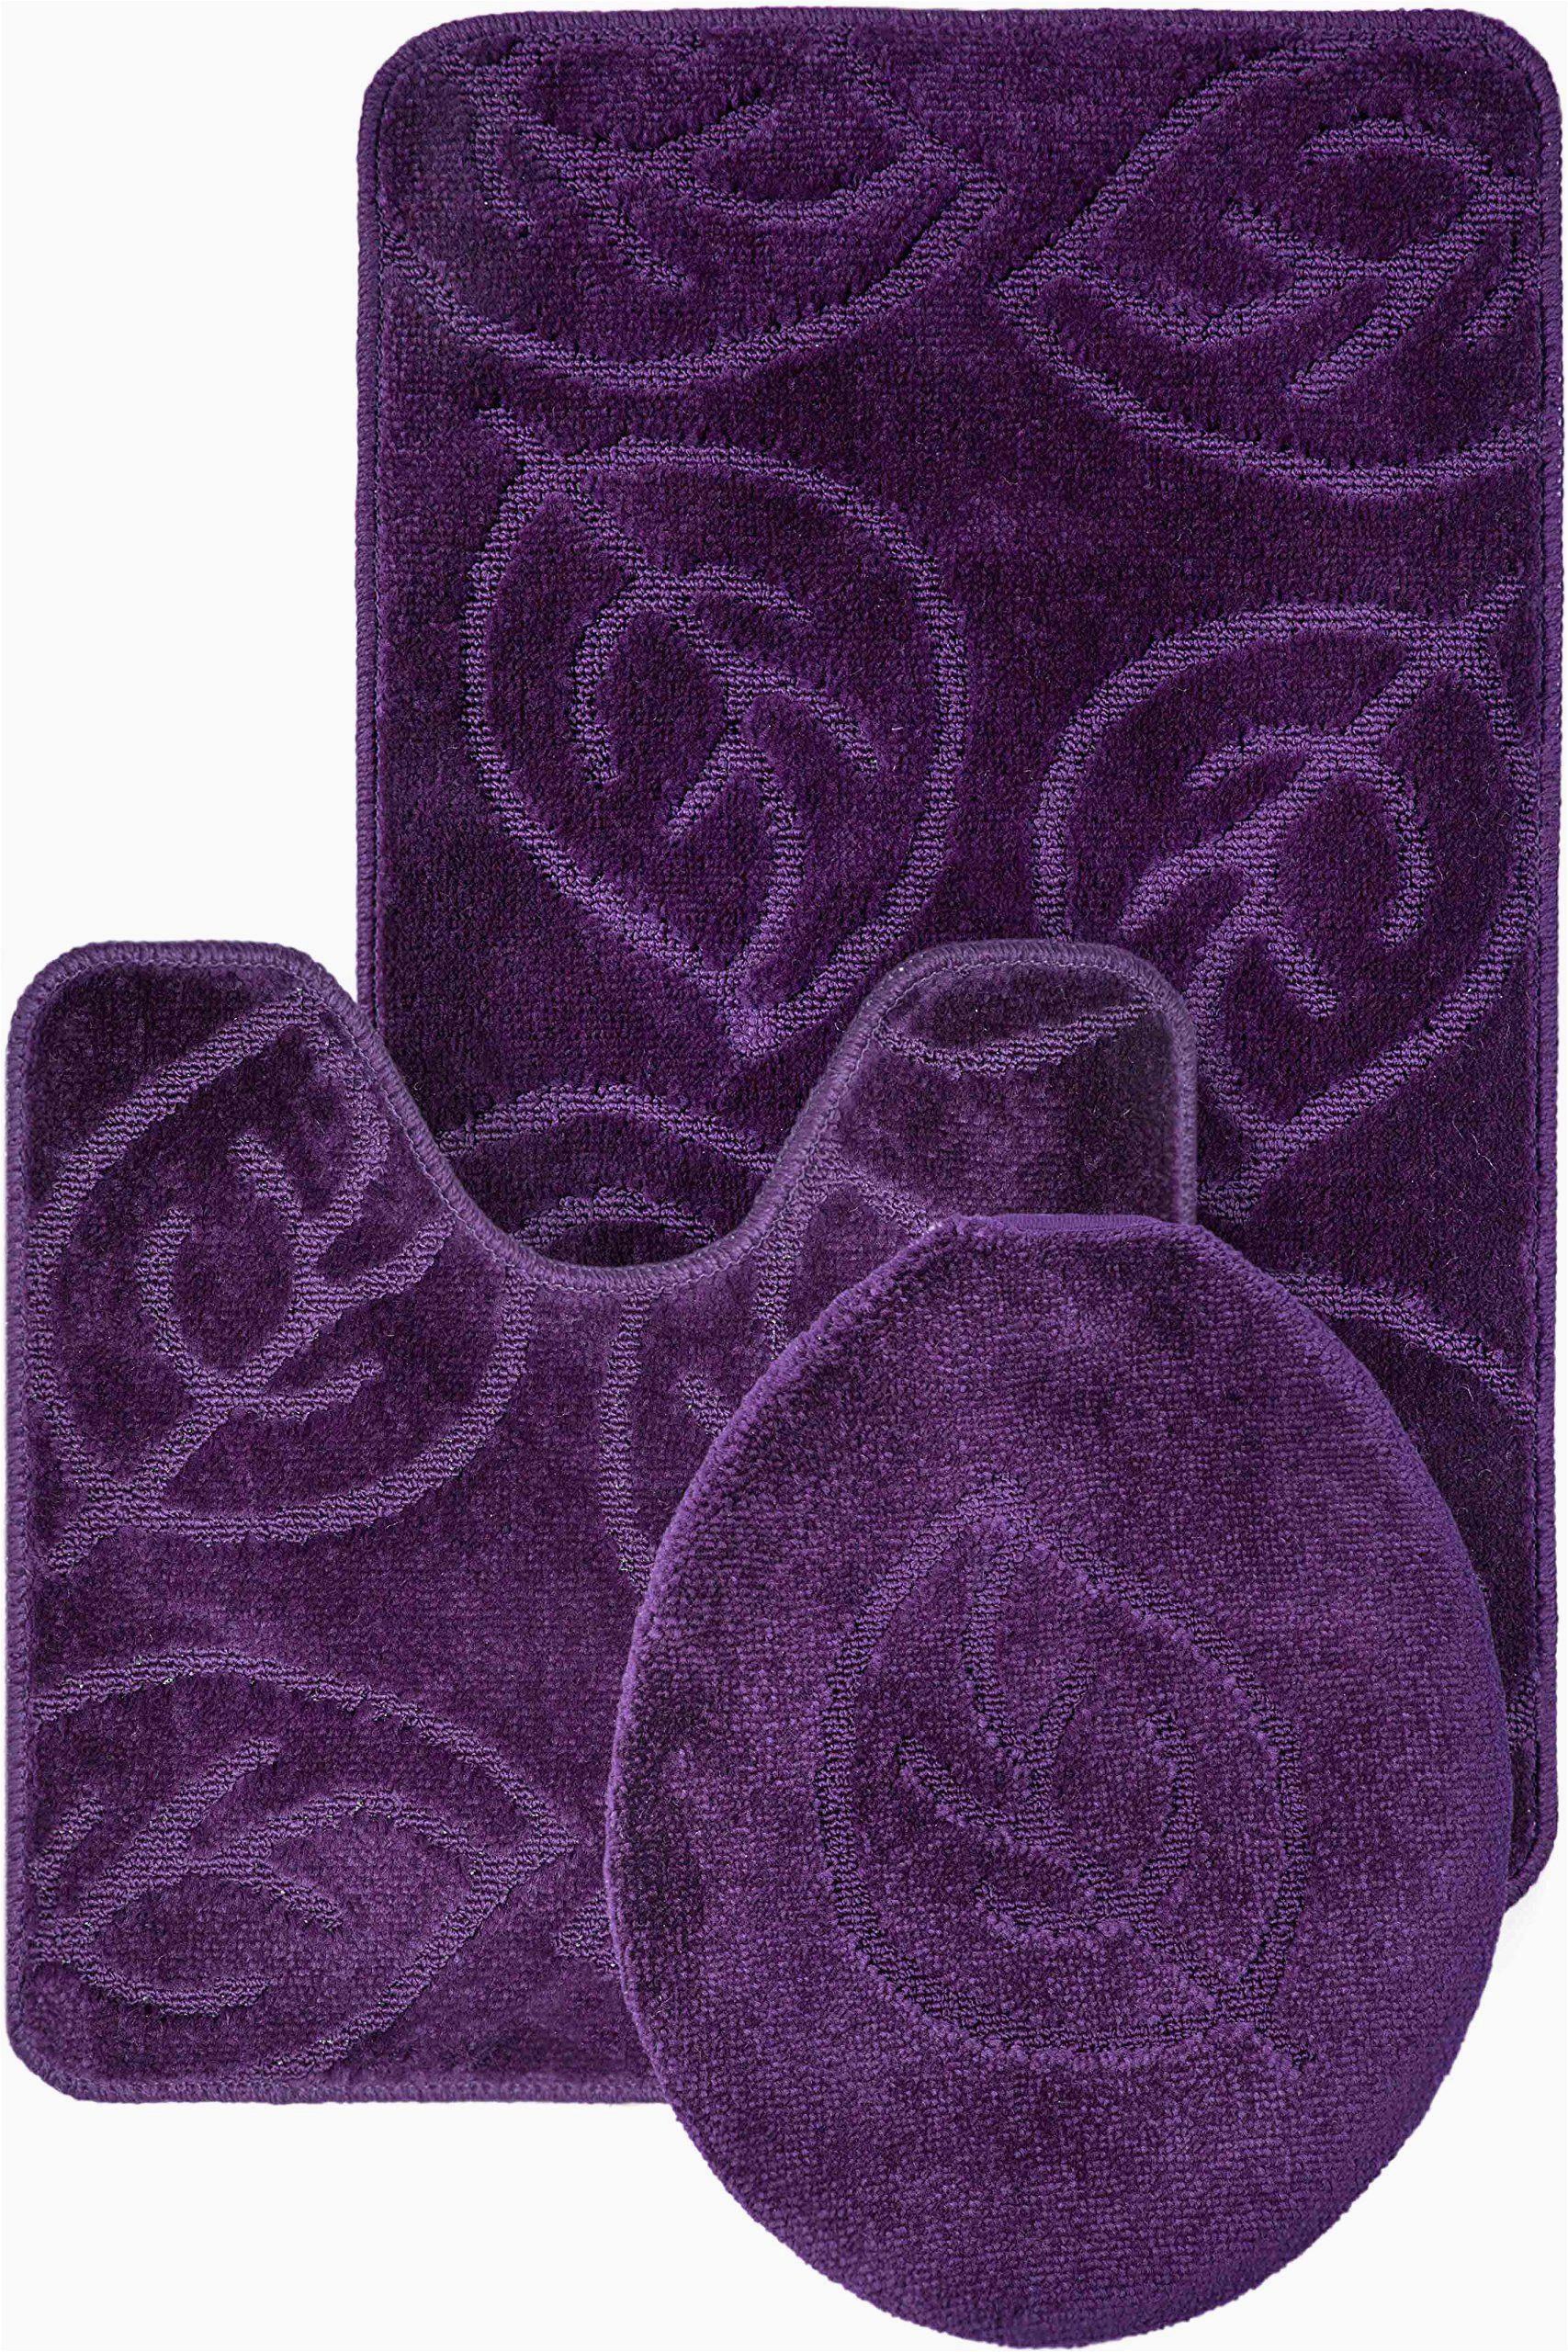 Lavender Bathroom Rug Sets Everdayspecial Purple Bath Set Leaf Pattern Bathroom Rug